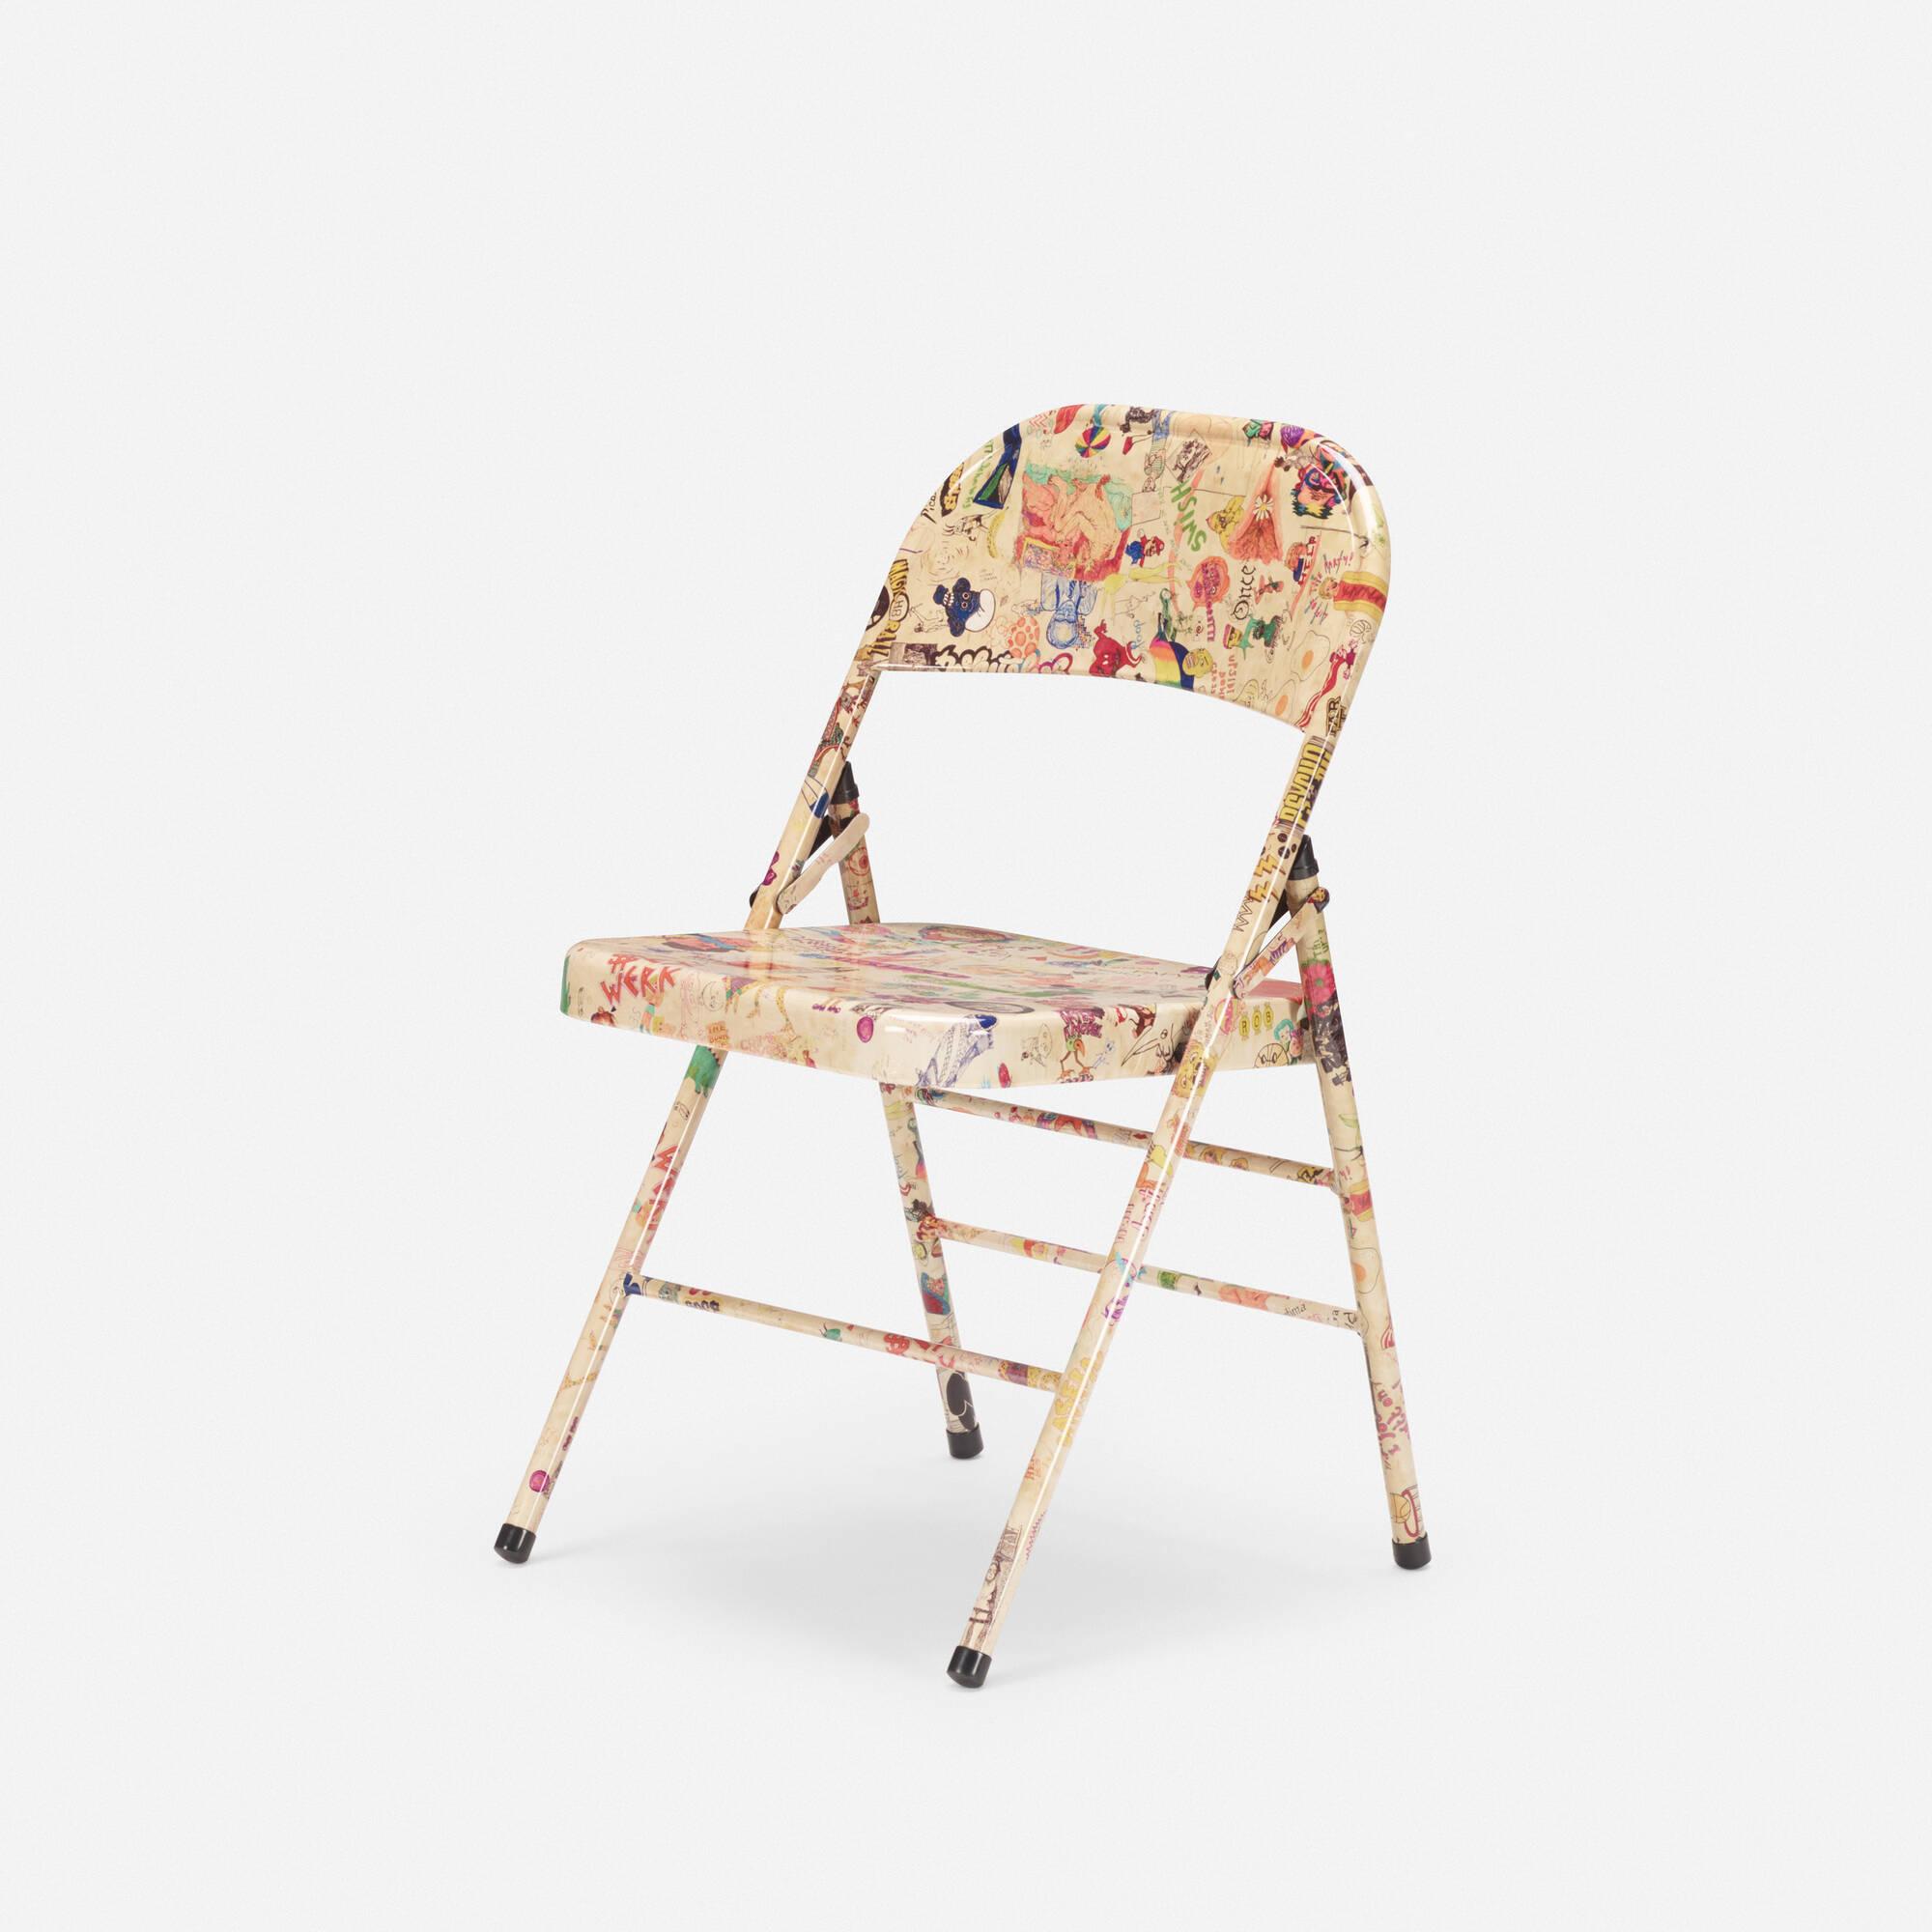 116: Rob Pruitt / Graffiti chair (1 of 3)